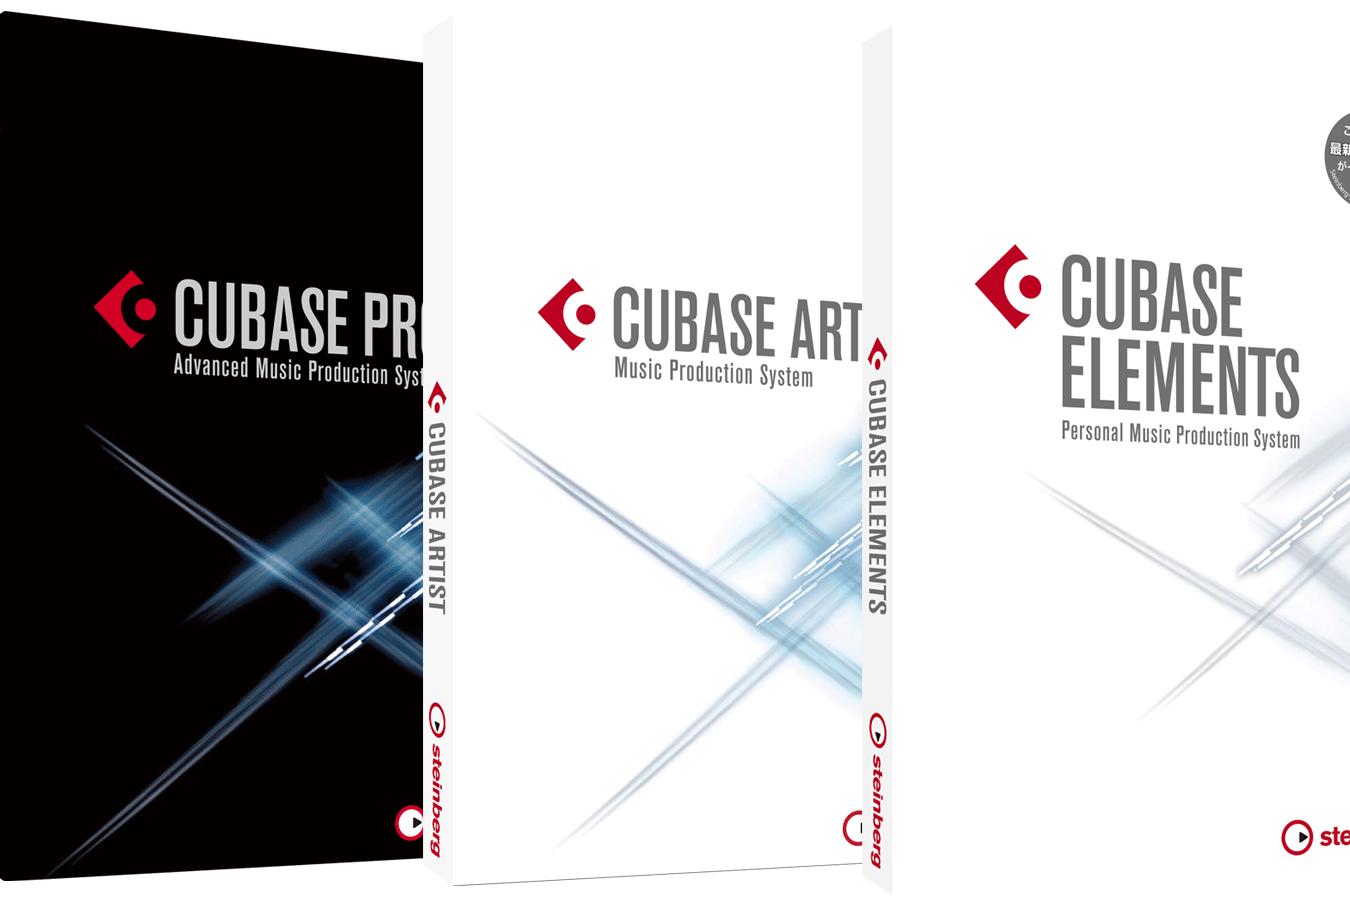 cubase dtmers 音楽制作者のためのwebマガジン by イシバシ楽器